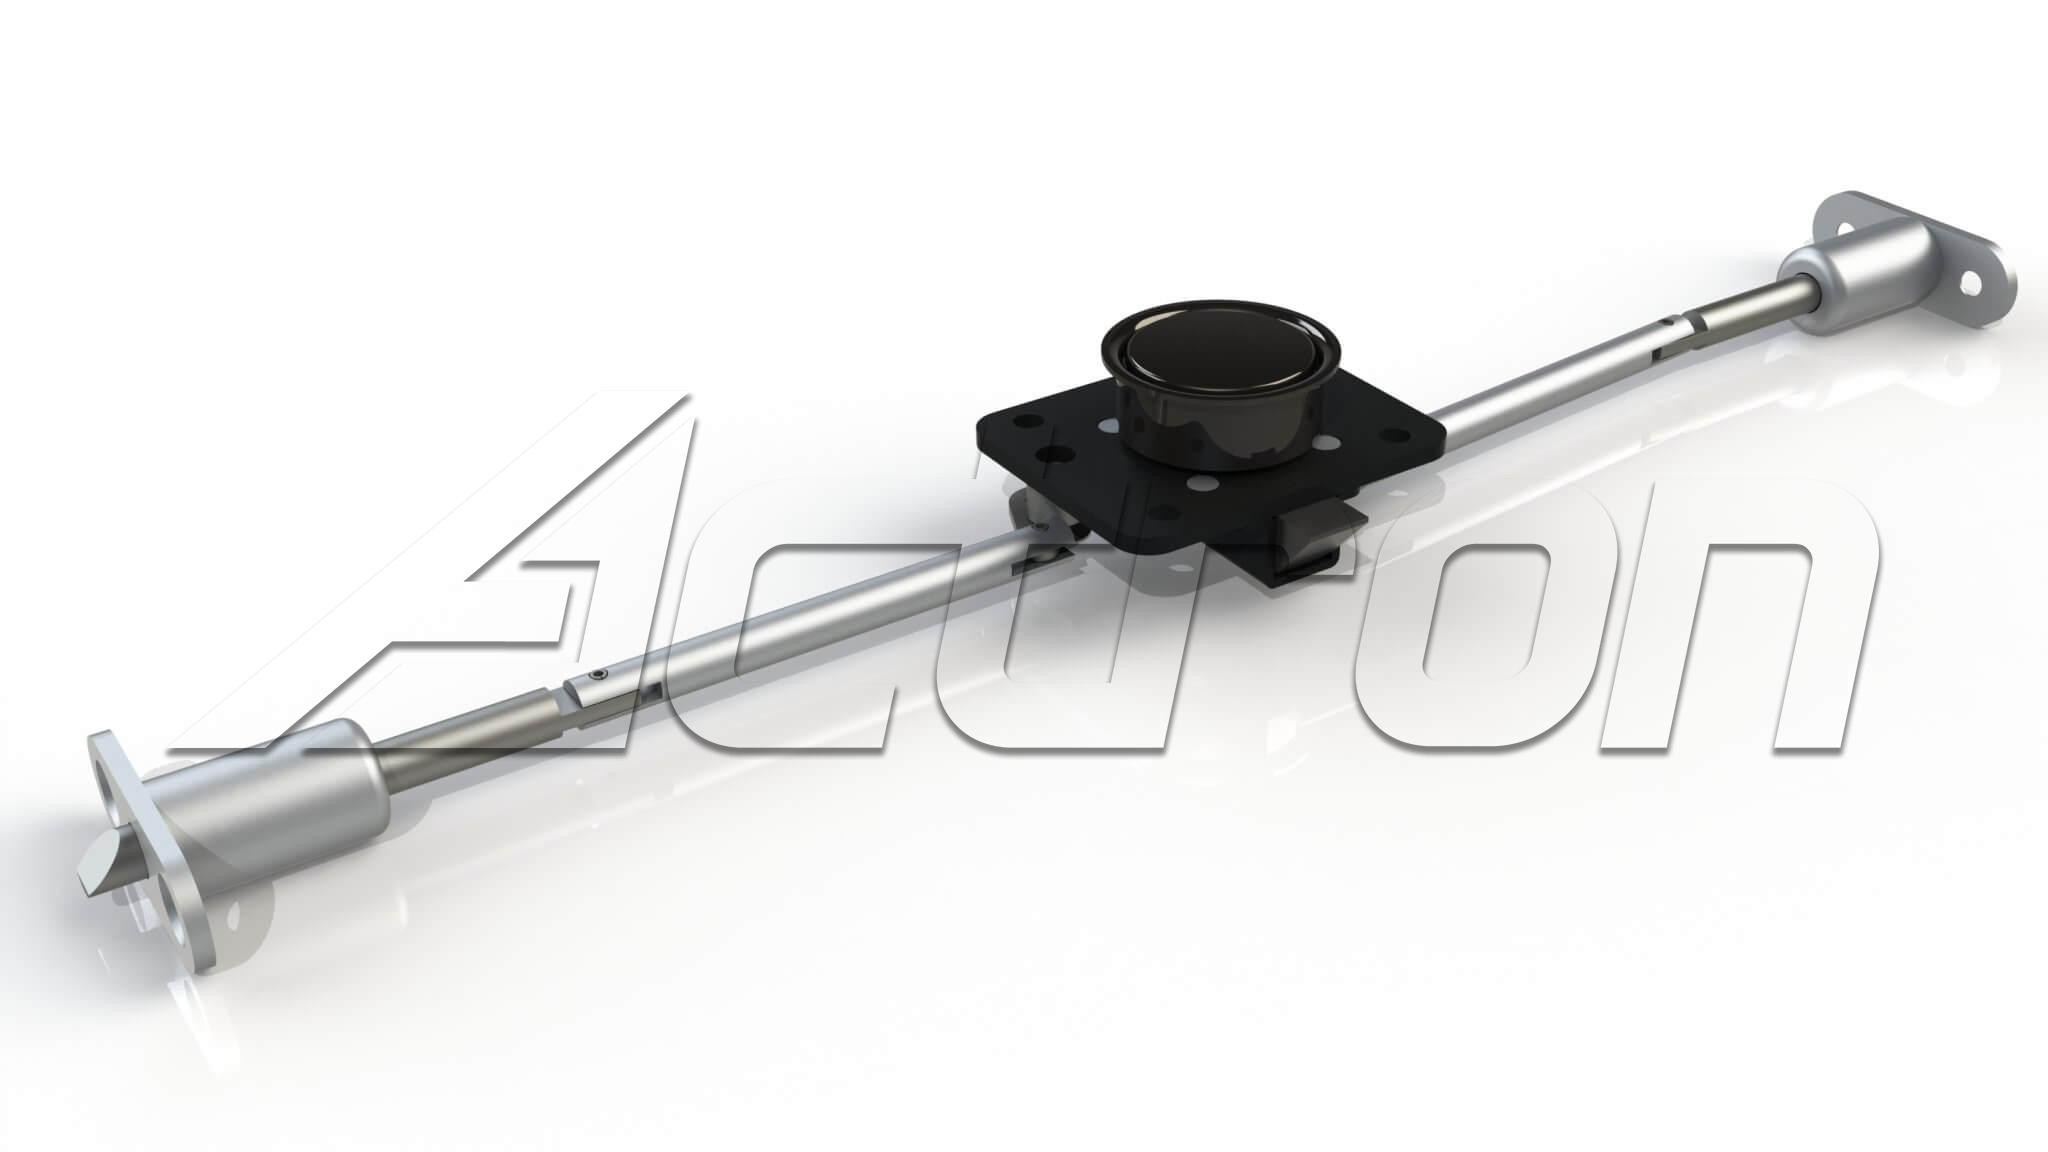 door-bolting-system-8211-push-button-5512-a39065.jpg